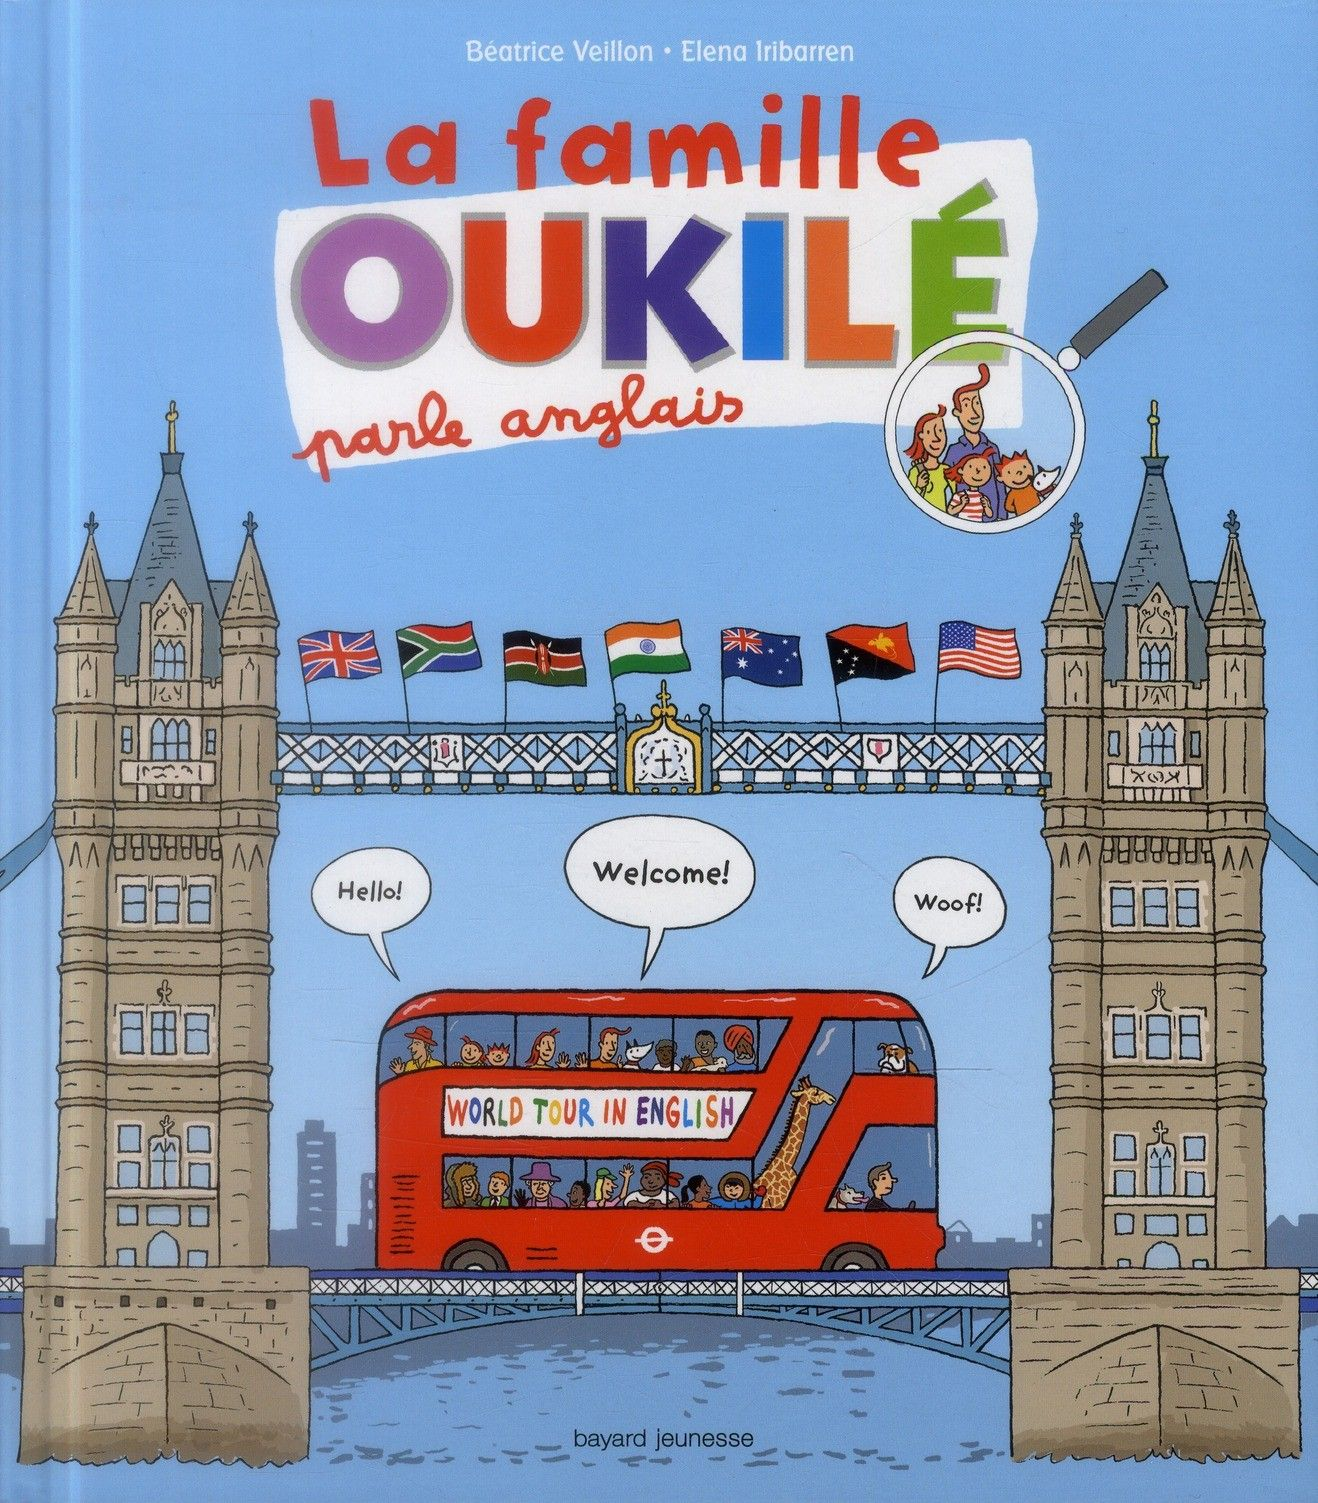 La Famille Oukile Parle Anglais